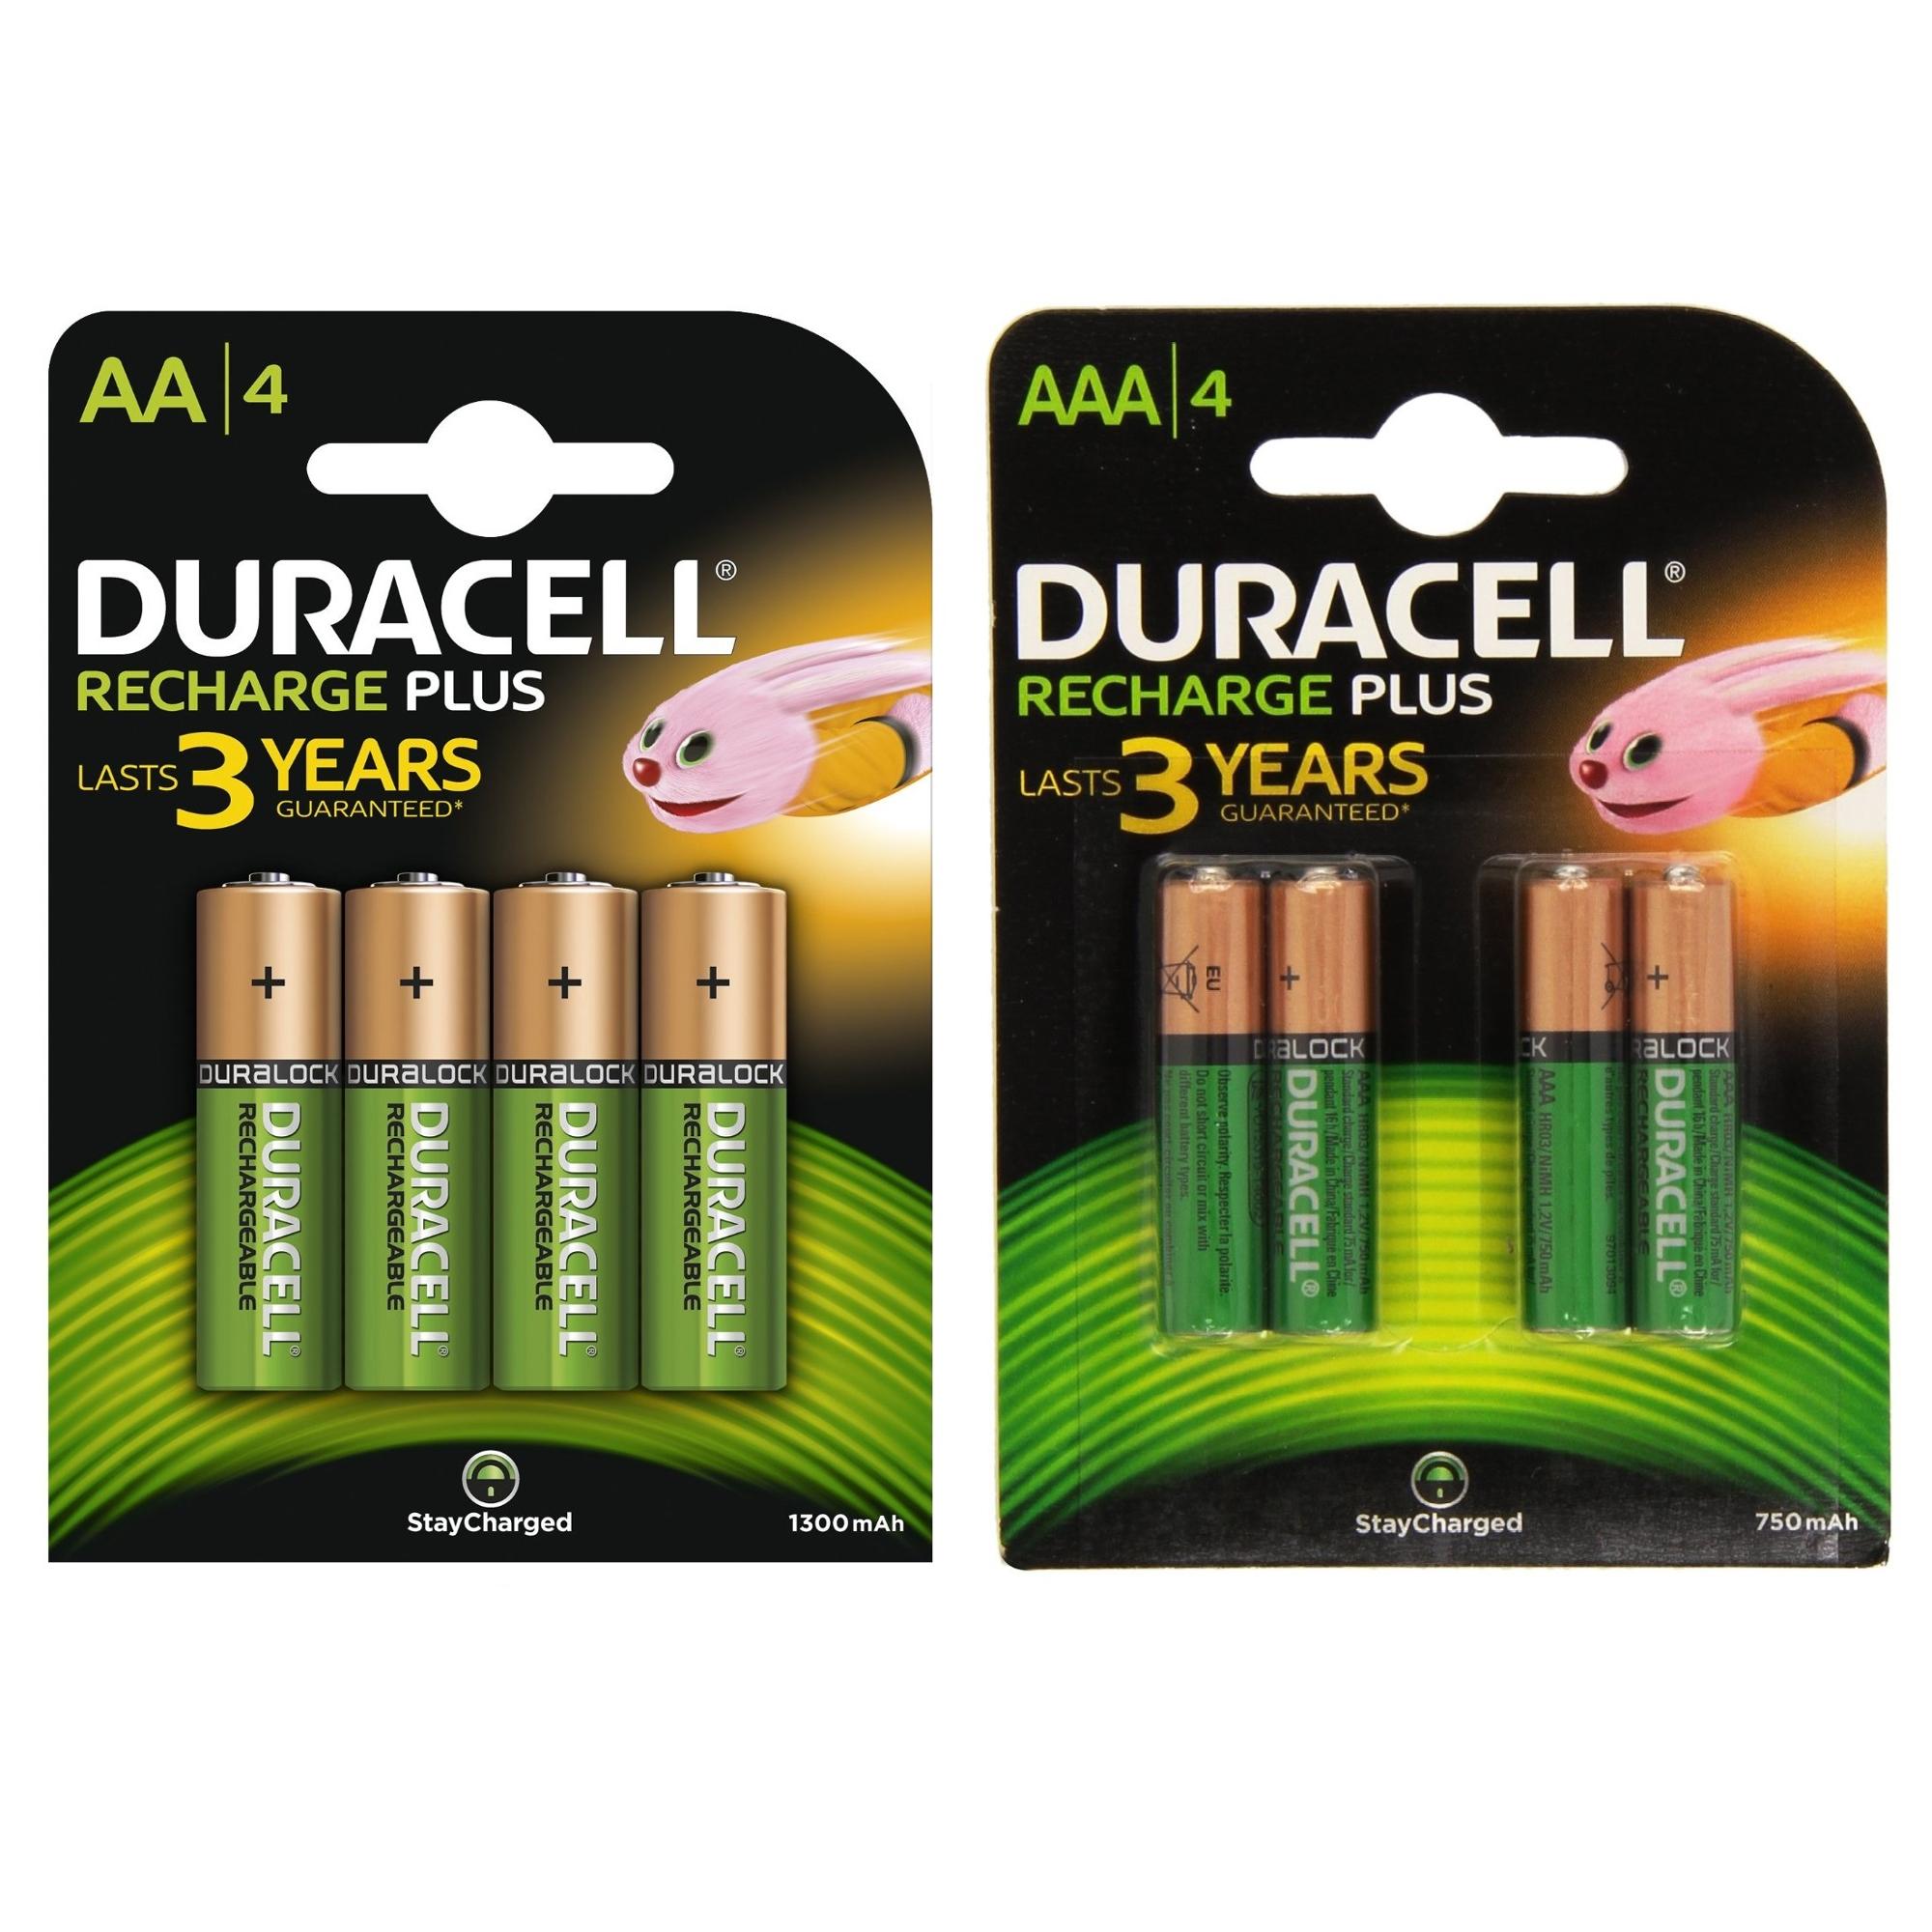 duracell plus aa aaa rechargeable t l commande pile pour appareil photo piles ebay. Black Bedroom Furniture Sets. Home Design Ideas